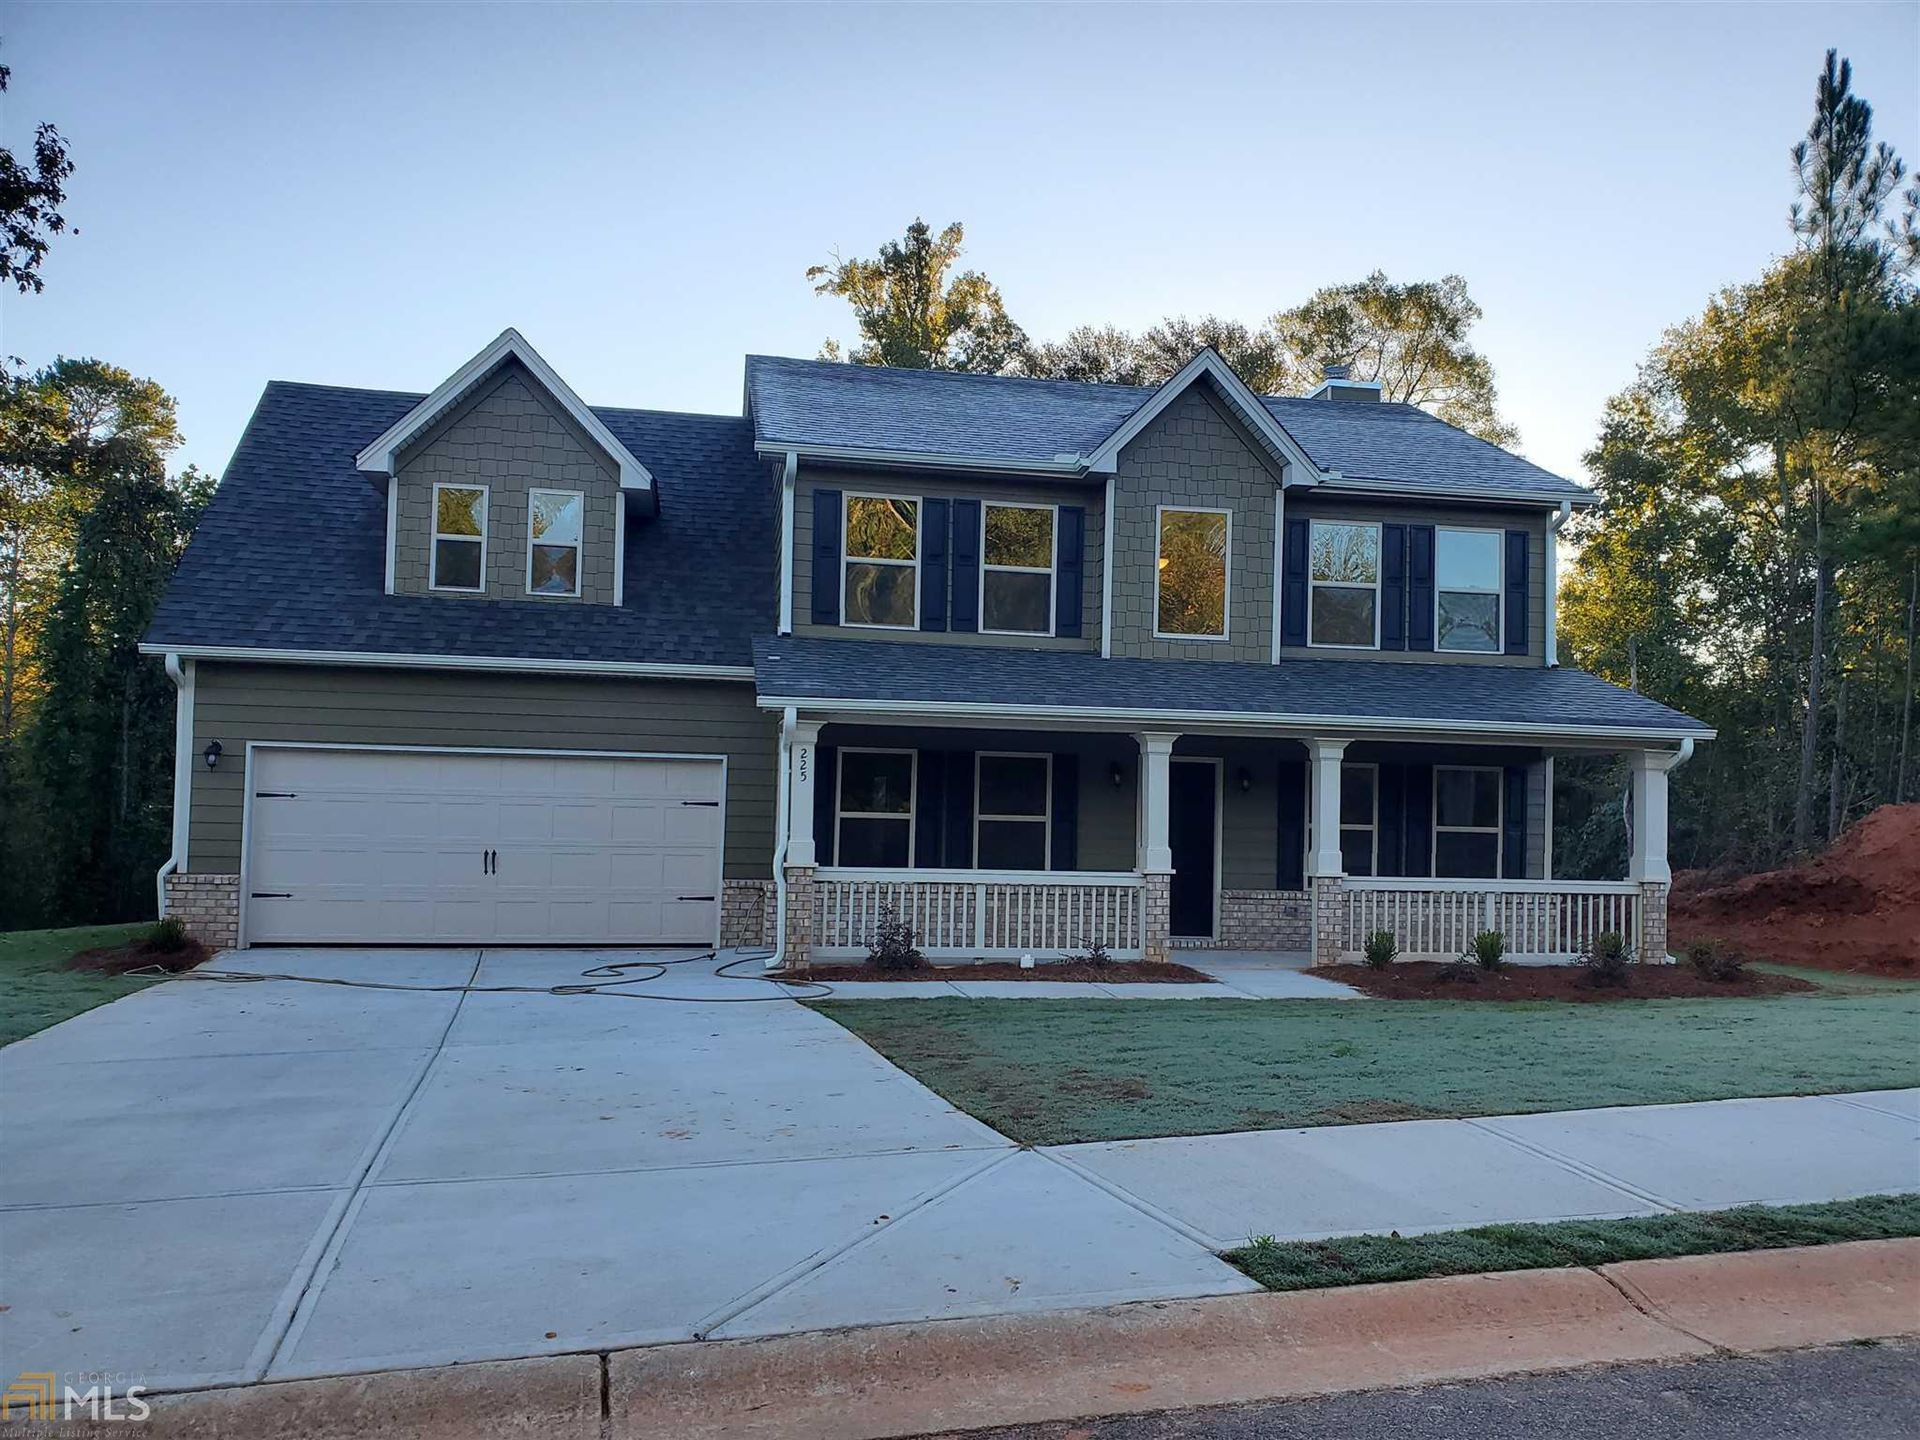 235 First St, Statham, GA 30666 - MLS#: 8894809